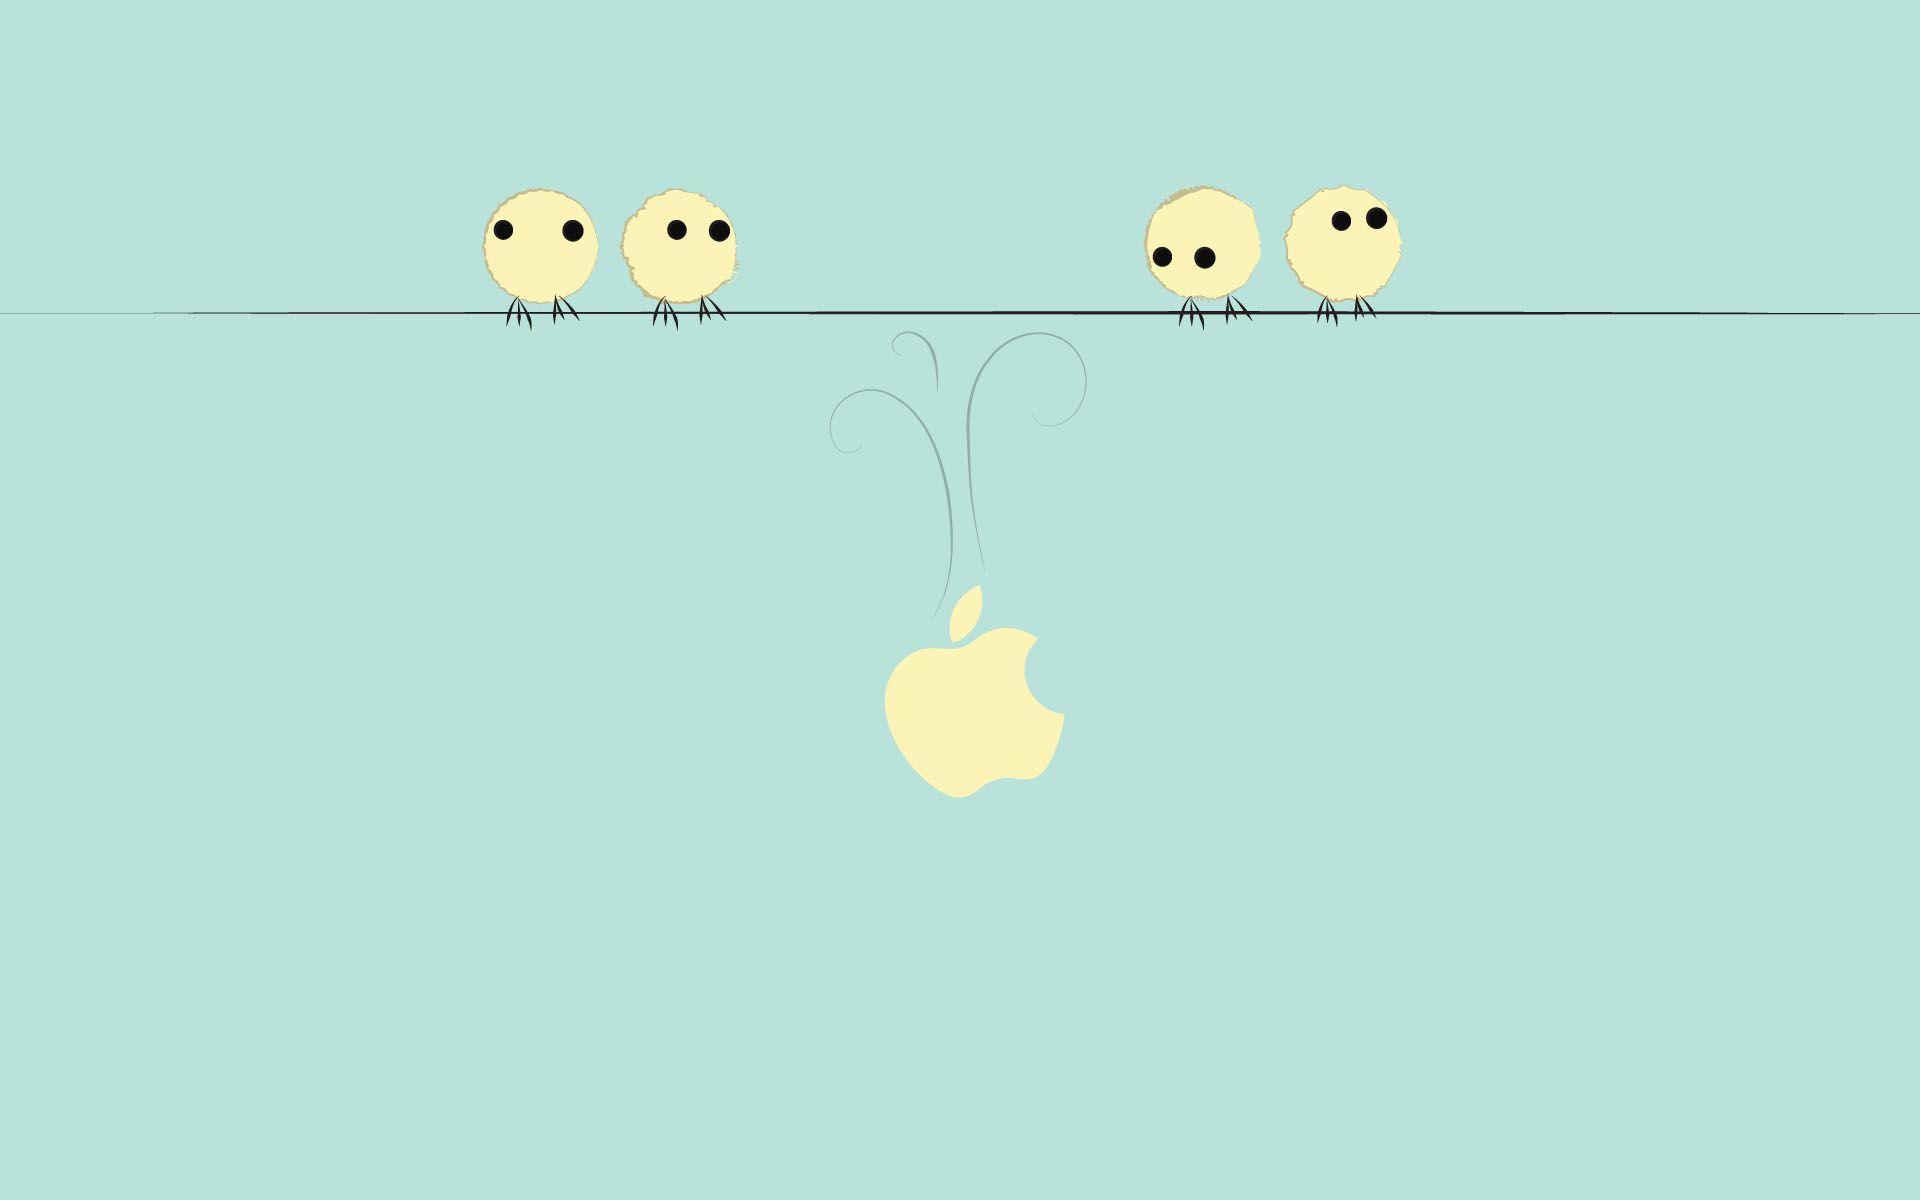 Cute Tumblr Desktop Wallpapers Top Free Cute Tumblr Desktop Backgrounds Wallpaperaccess